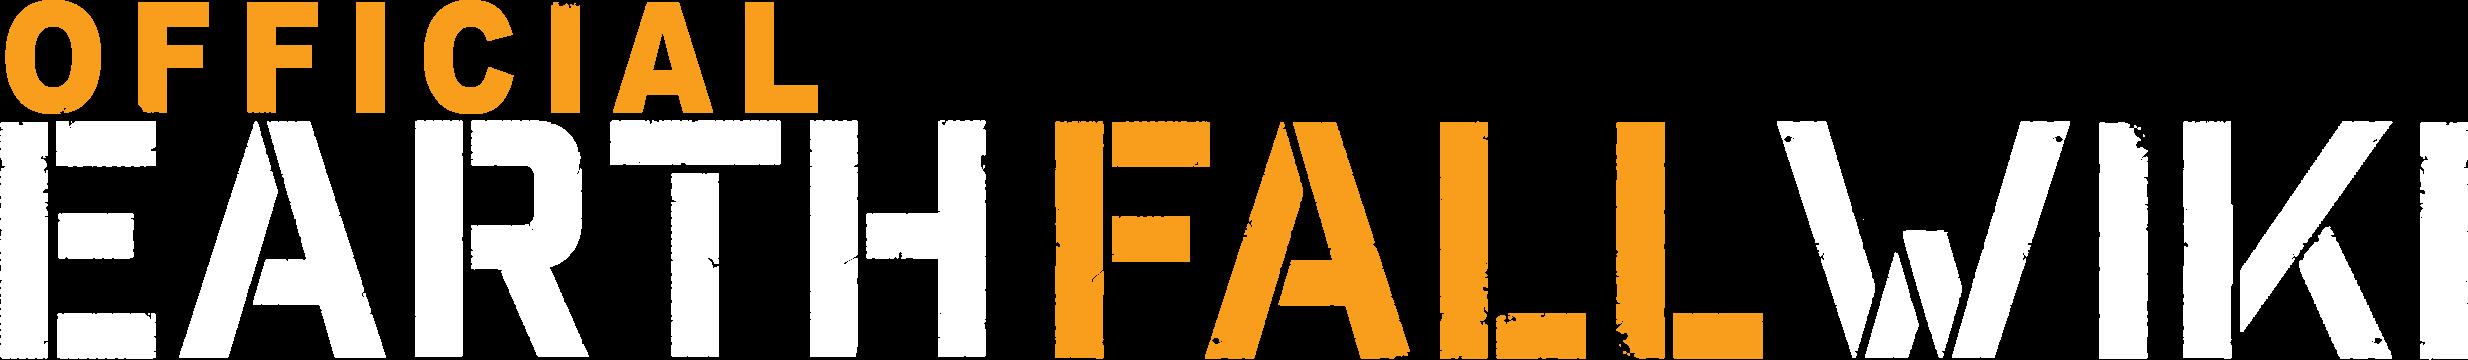 Earthfall Wiki